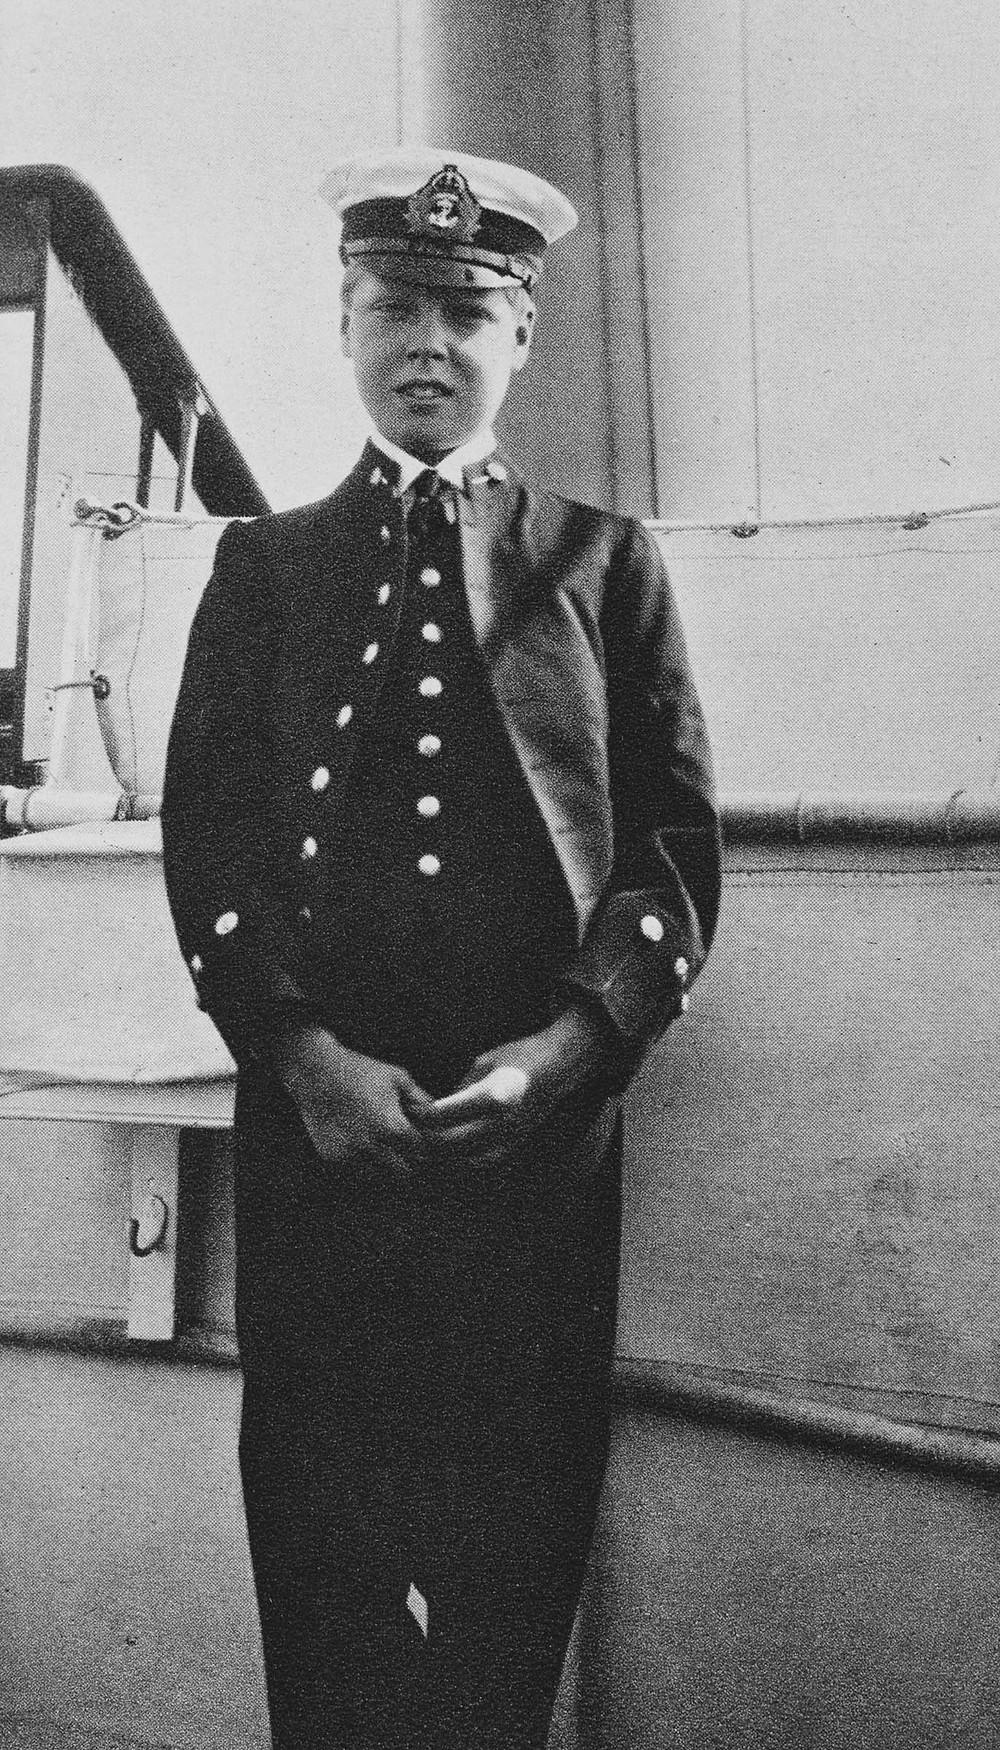 King Edward VIII when Prince Edward of Wales (1894-1972) circa 1907 . The Prince of Wales wearing Royal Navy uniform.